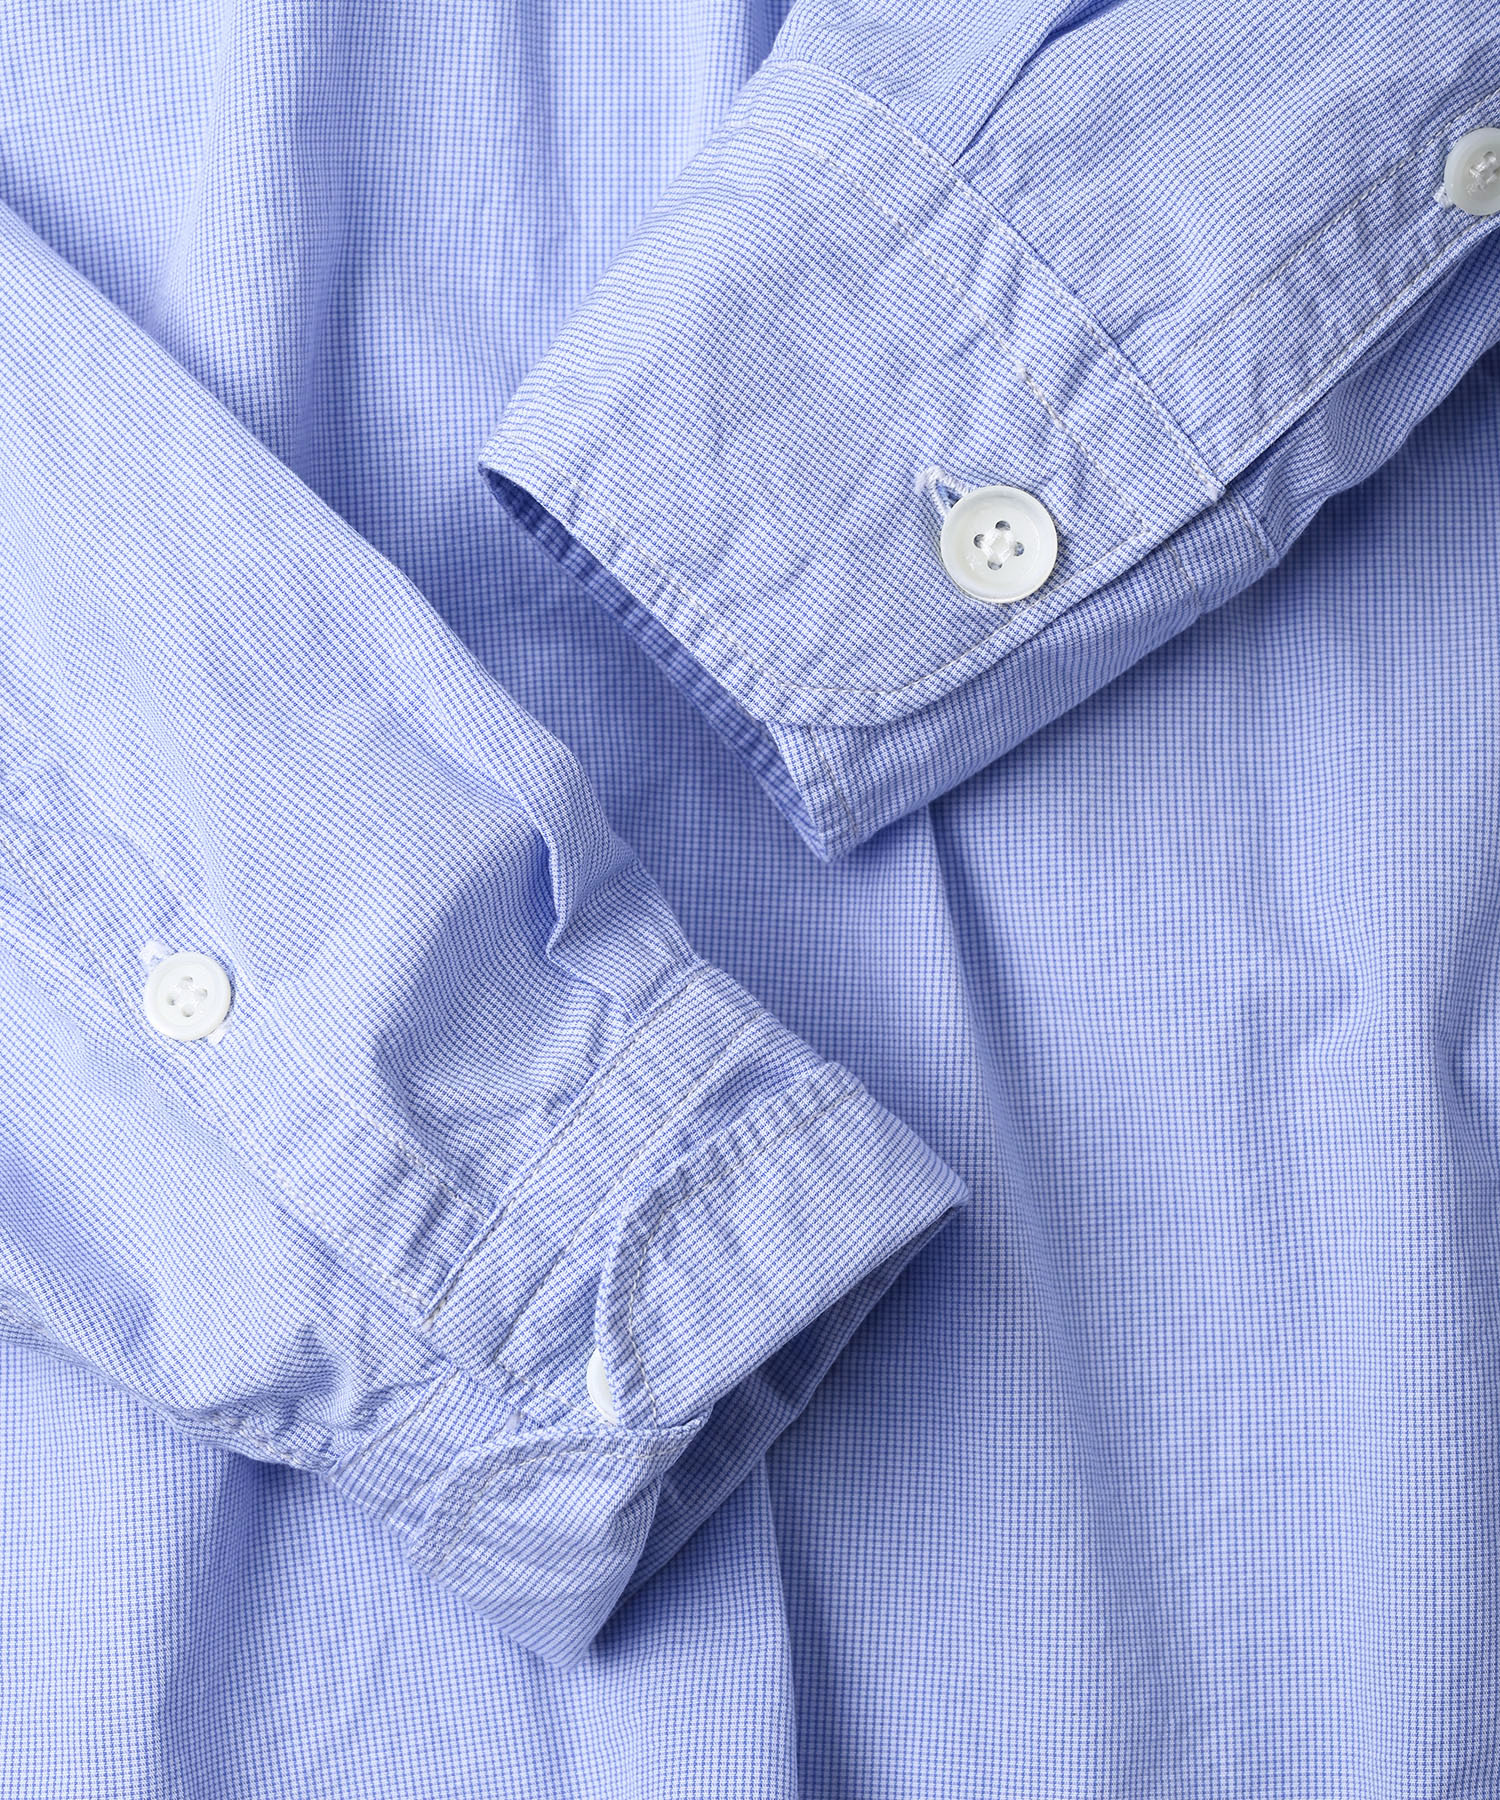 Damp Yarn Dyed 908 Ocean Pullover Shirt (0421)-12